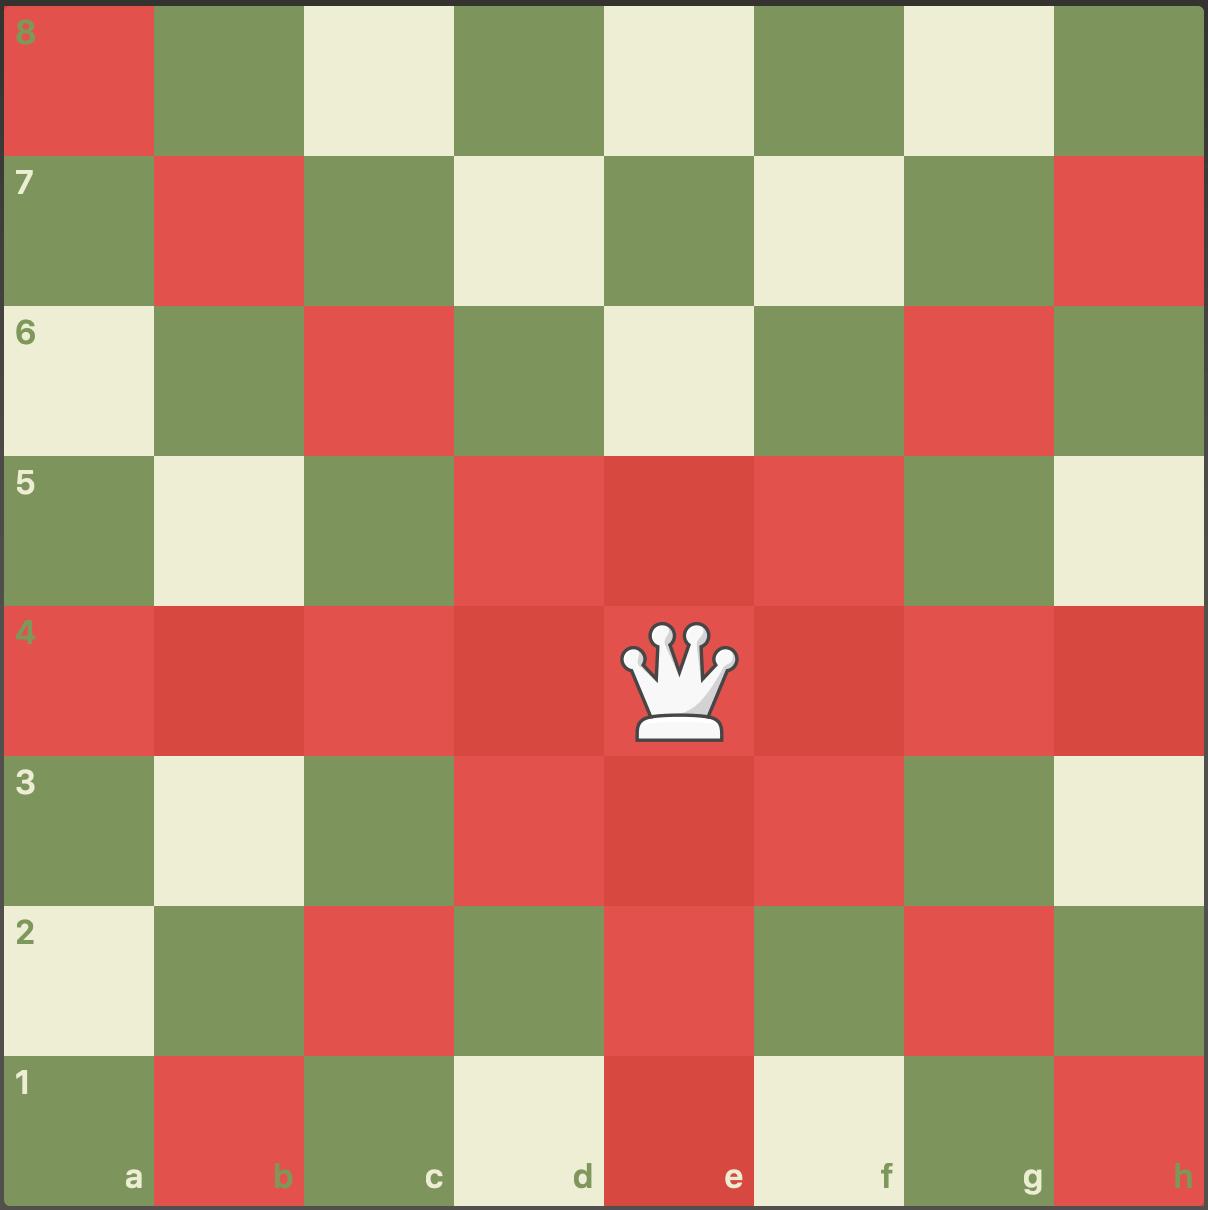 queen moves